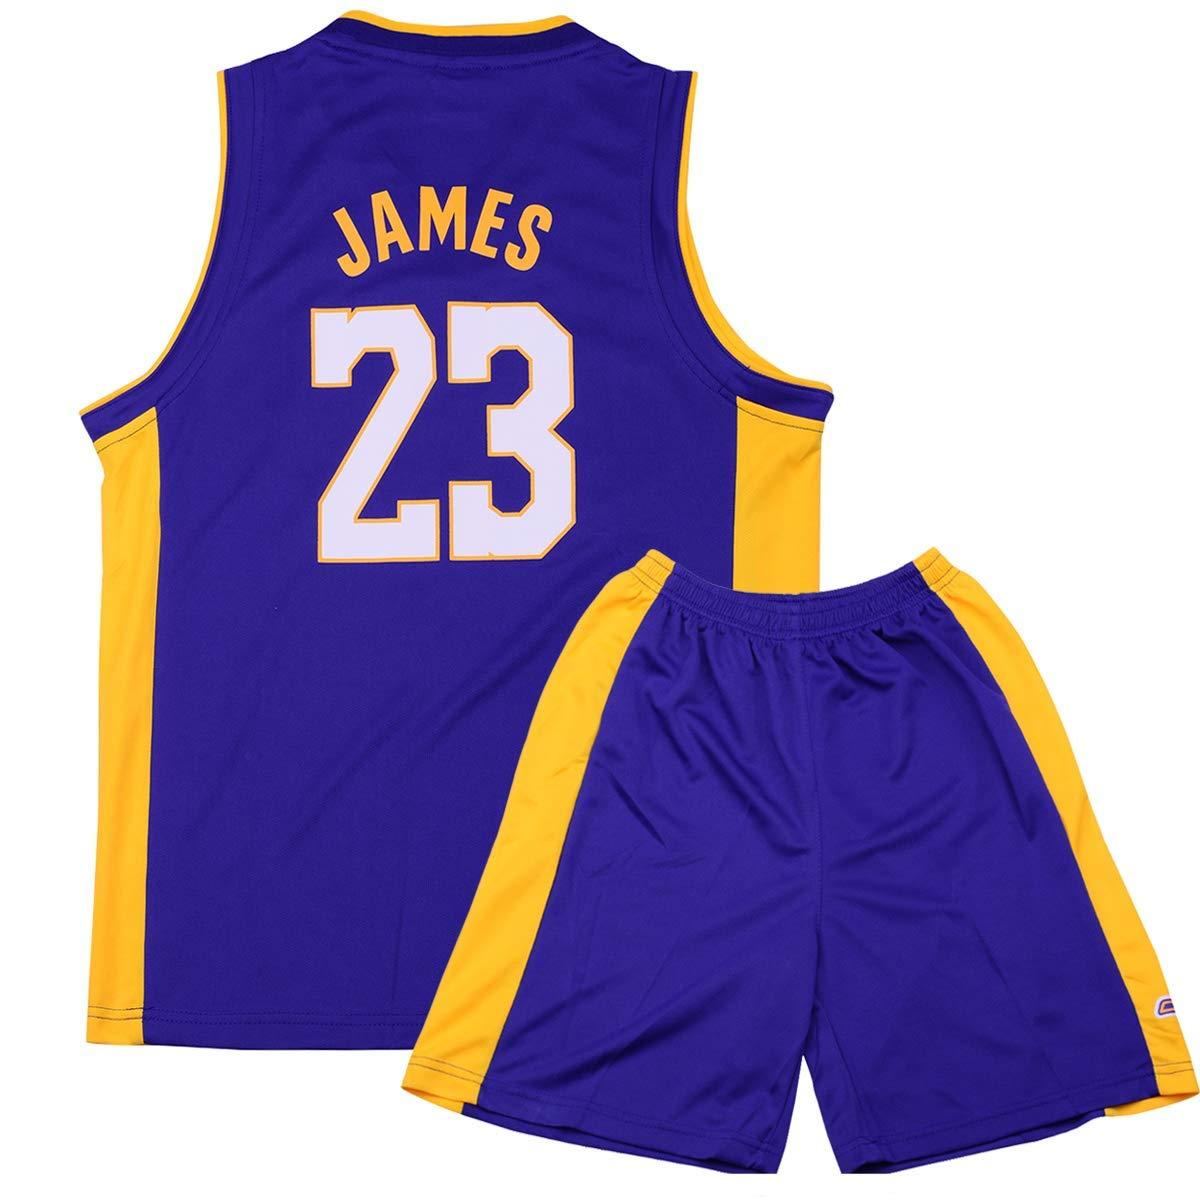 Formesy Bambini Ragazzi Ragazze Uomo Adulto NBA Lebron James #23 LBJ LA Lakers Retro Pantaloncino e Maglia Basketball Jersey Basket Maglie Uniforme Top /& Shorts 1 Set